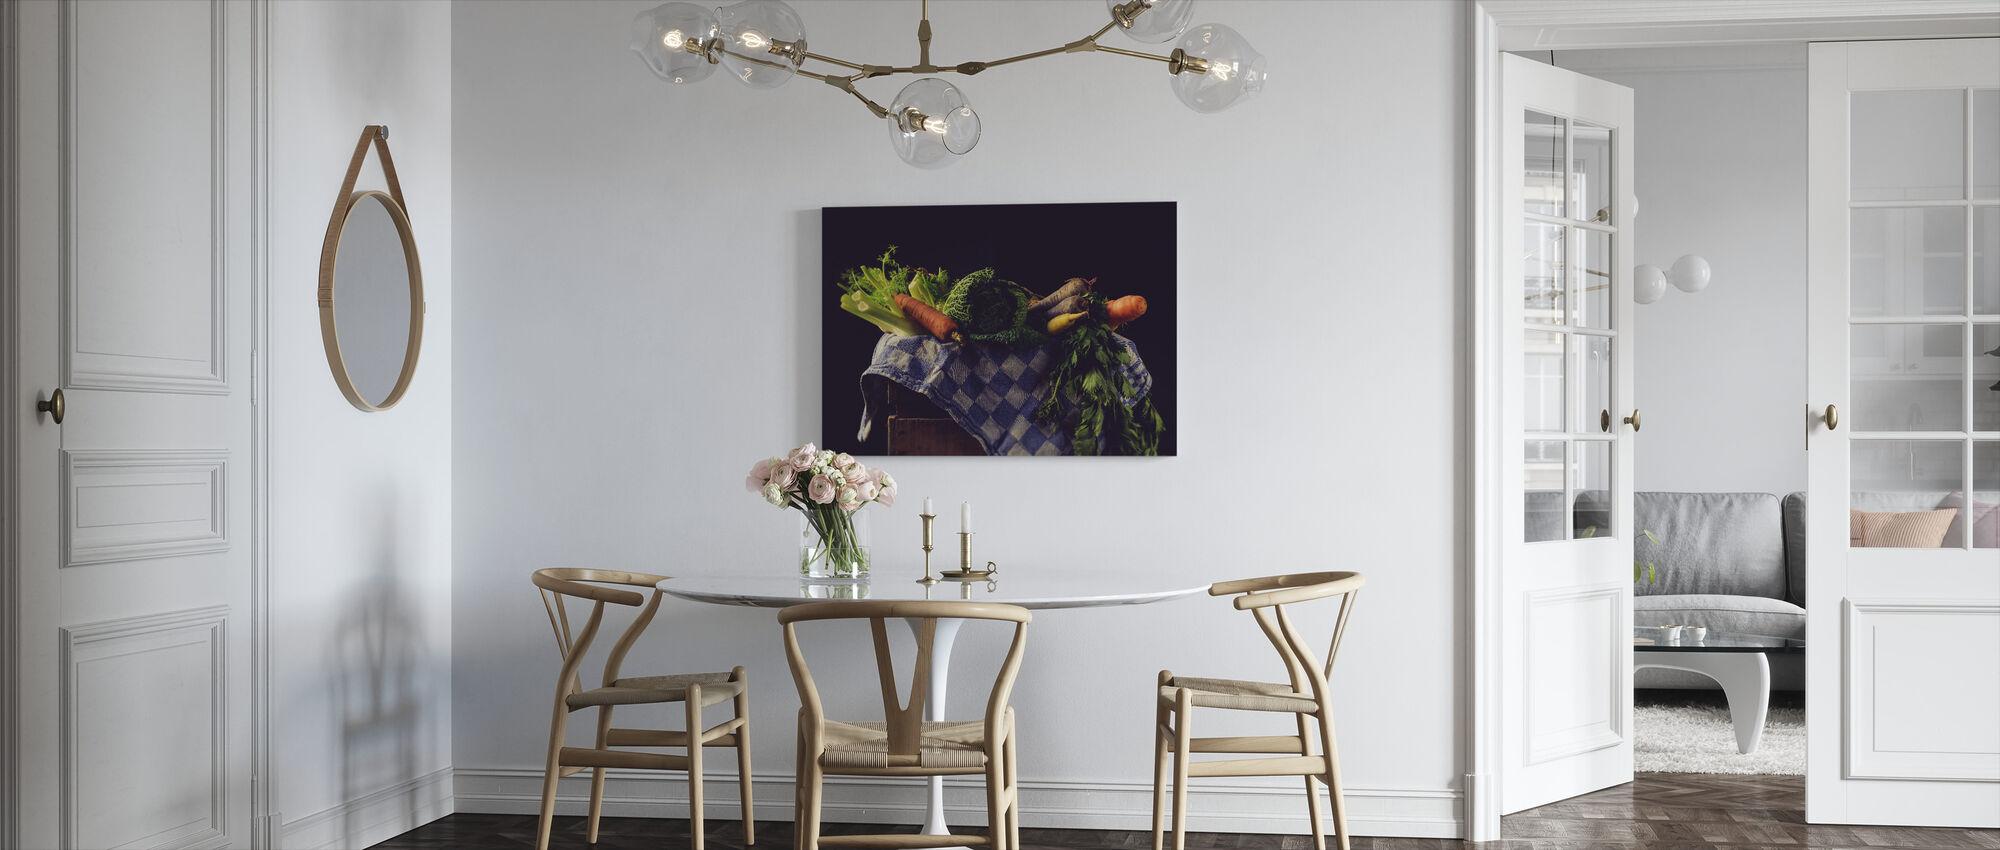 Vegetables - Canvas print - Kitchen